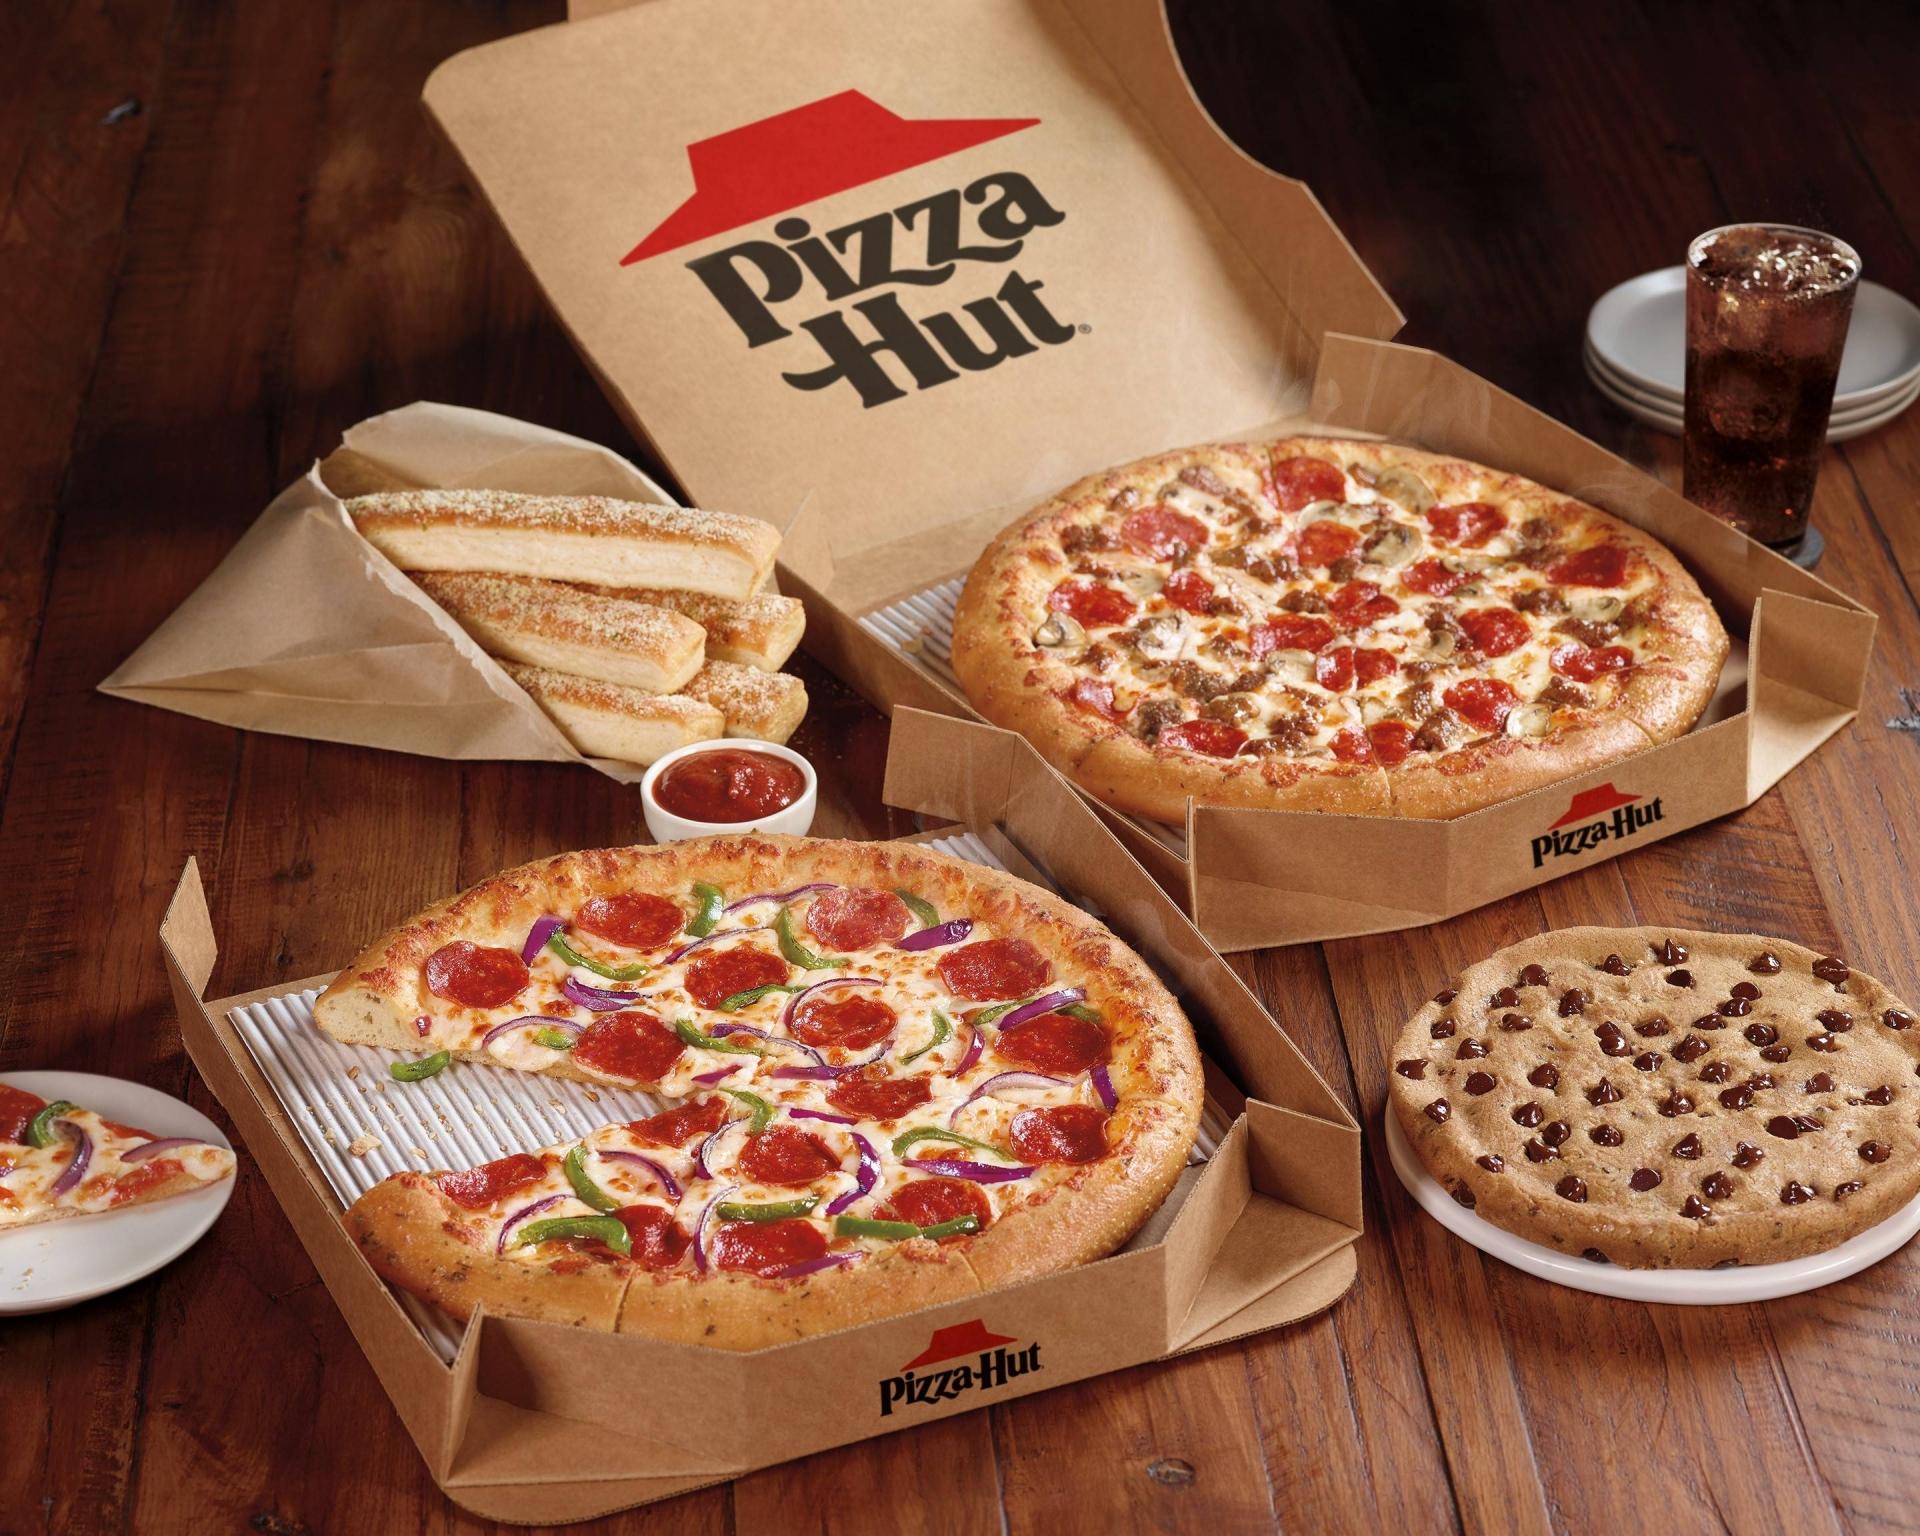 Pizza Hut pressed hard to raise dough in Vietnam